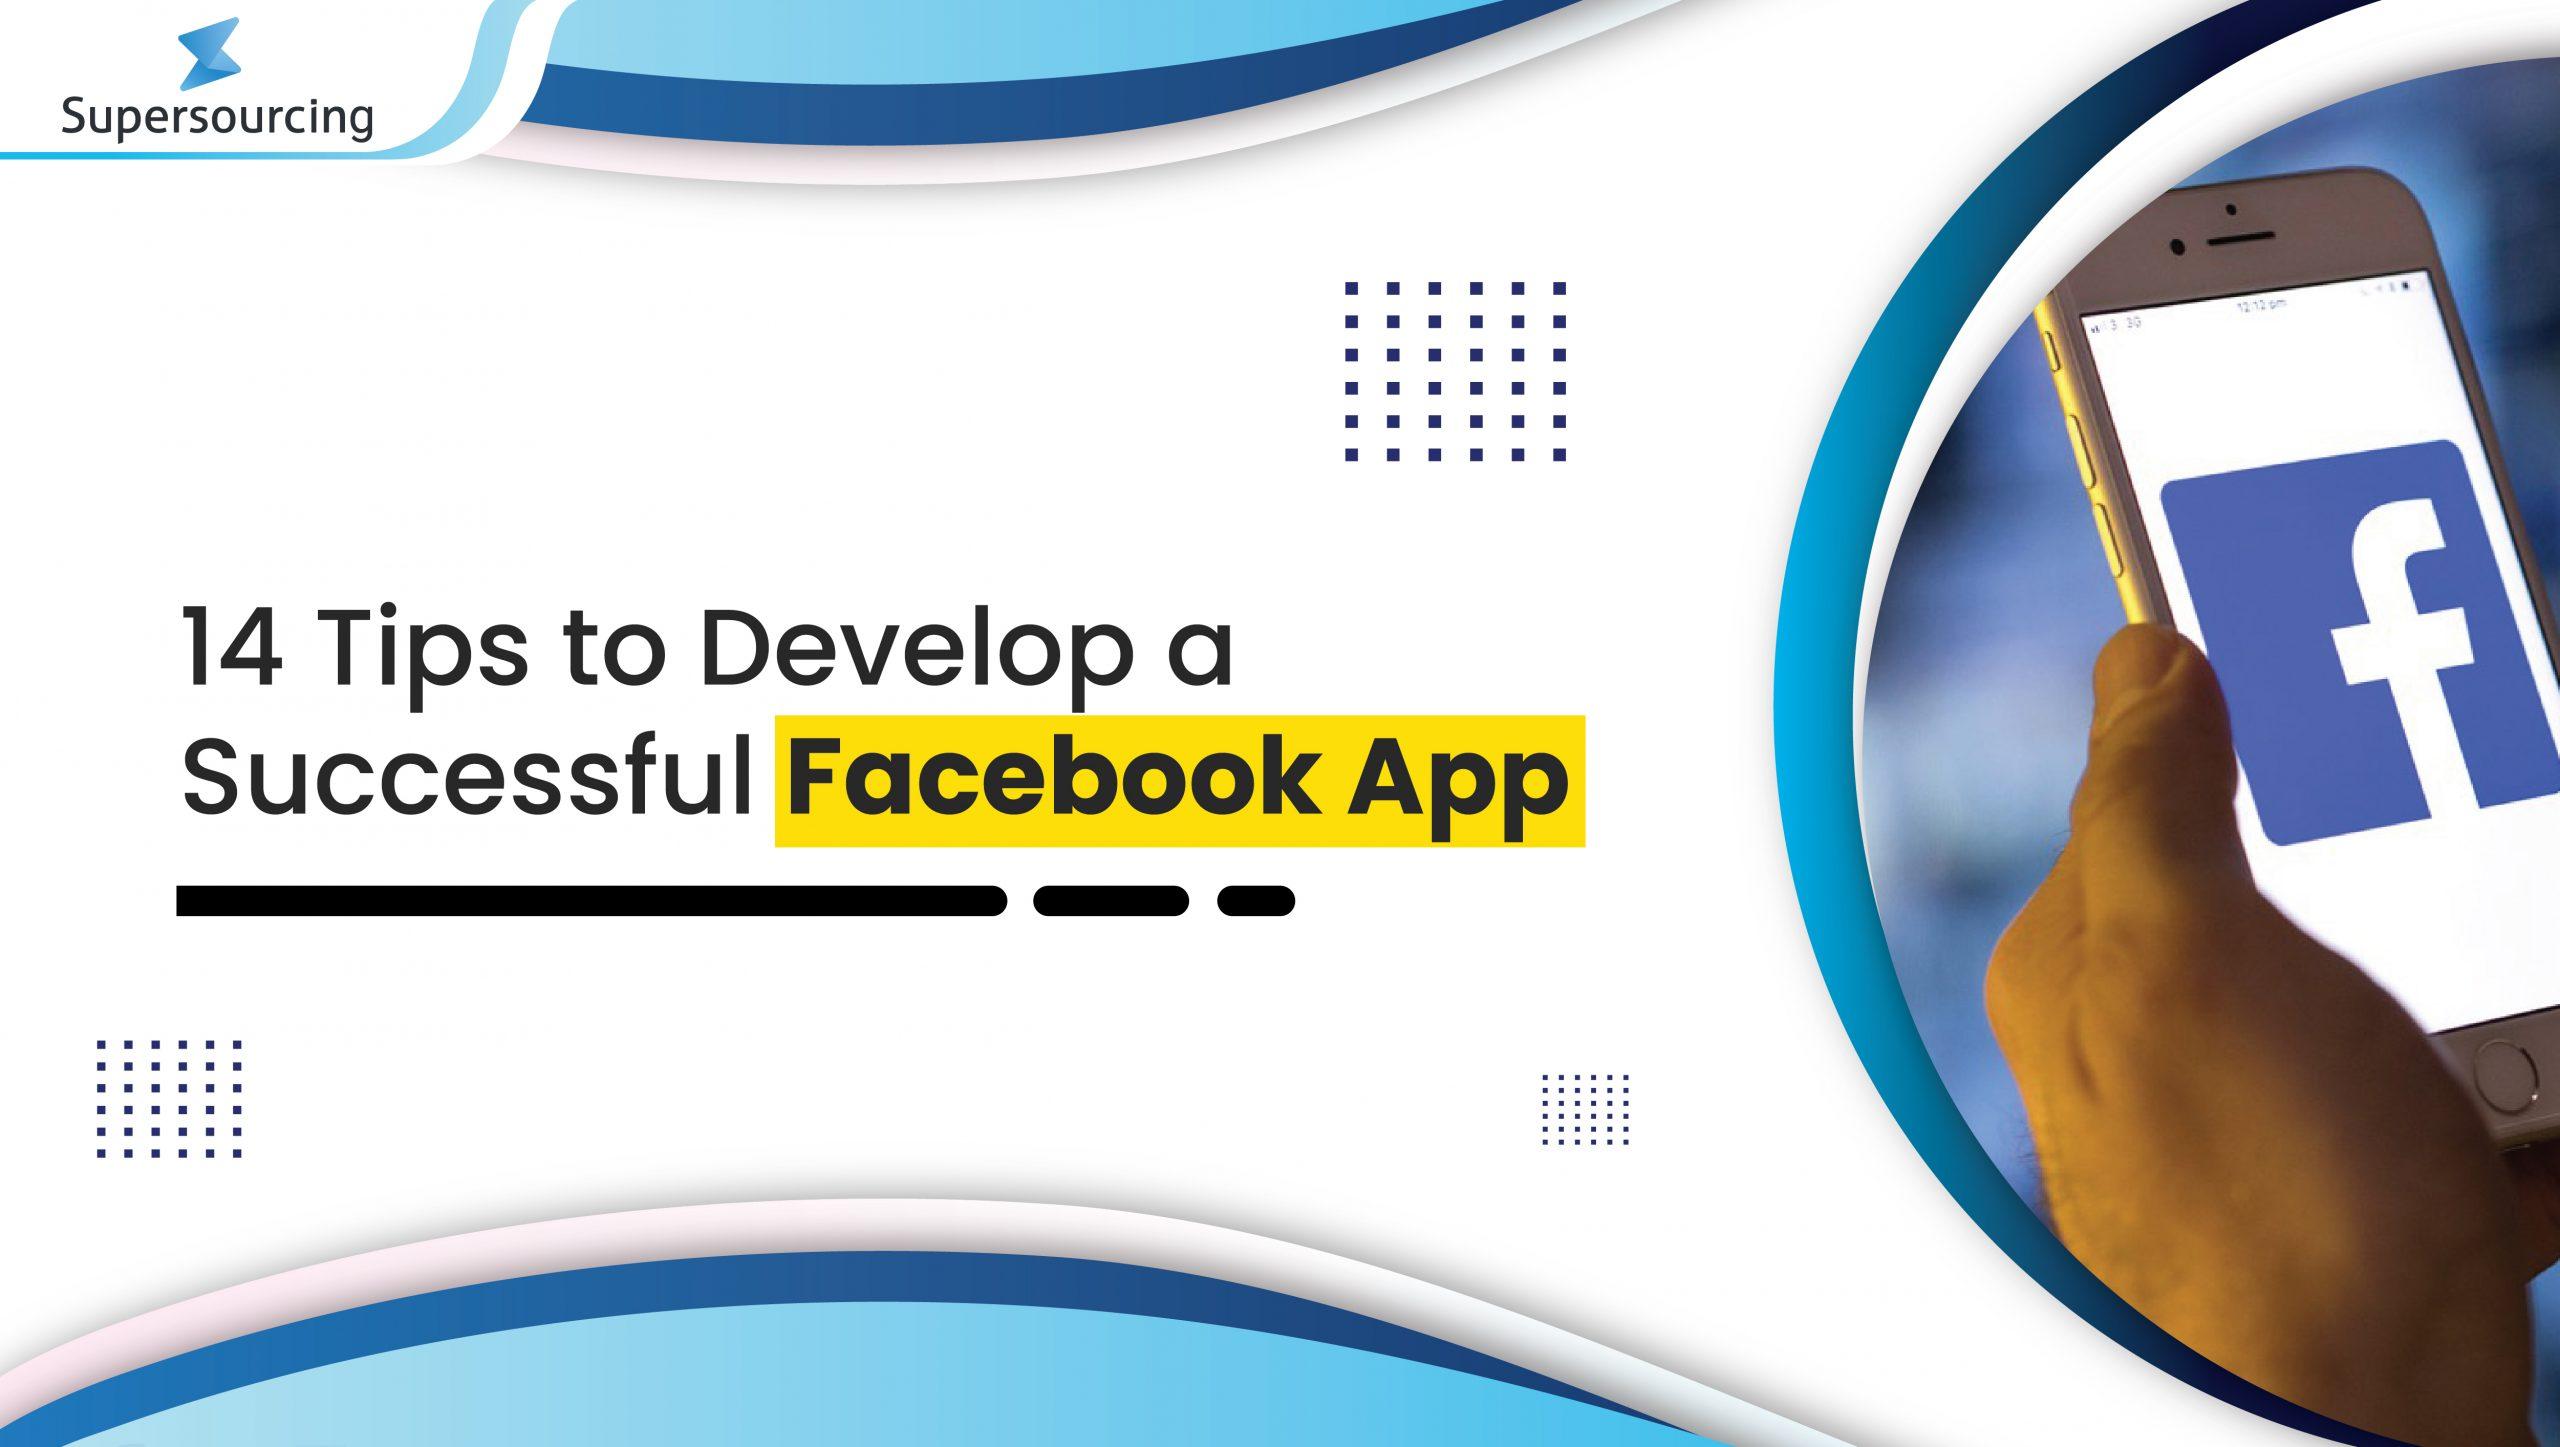 develop a successful Facebook app